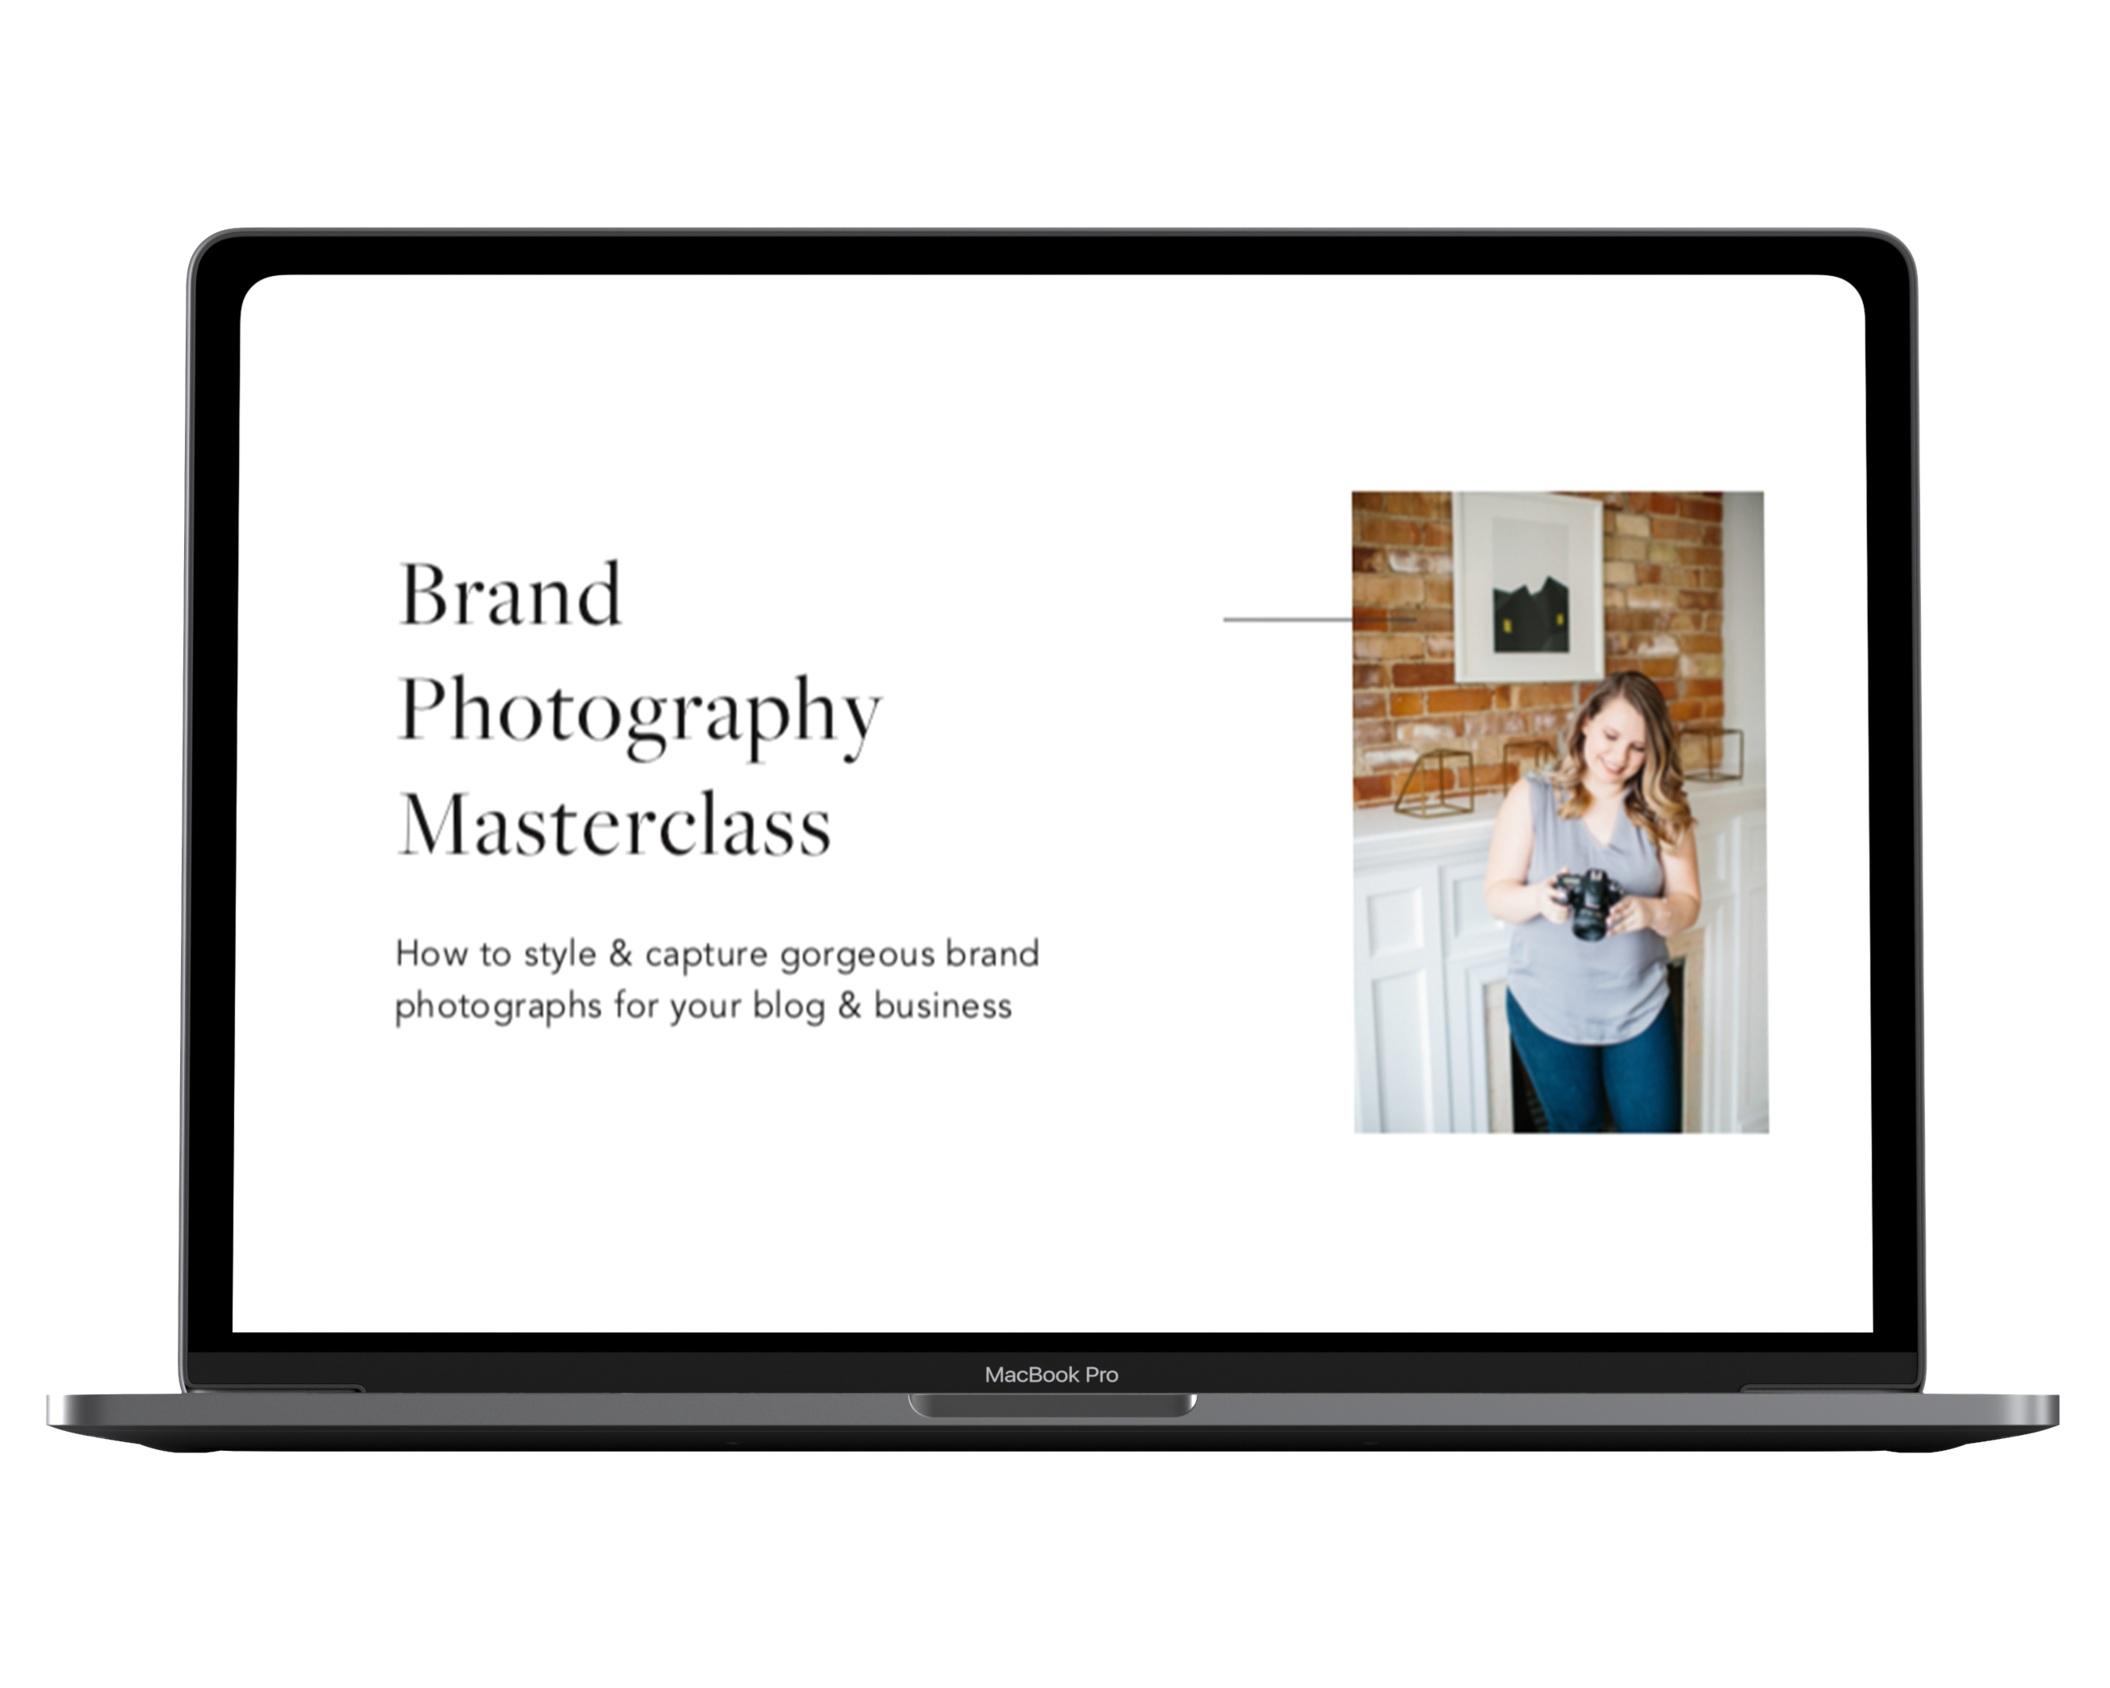 BP+Masterclass+graphic.jpg